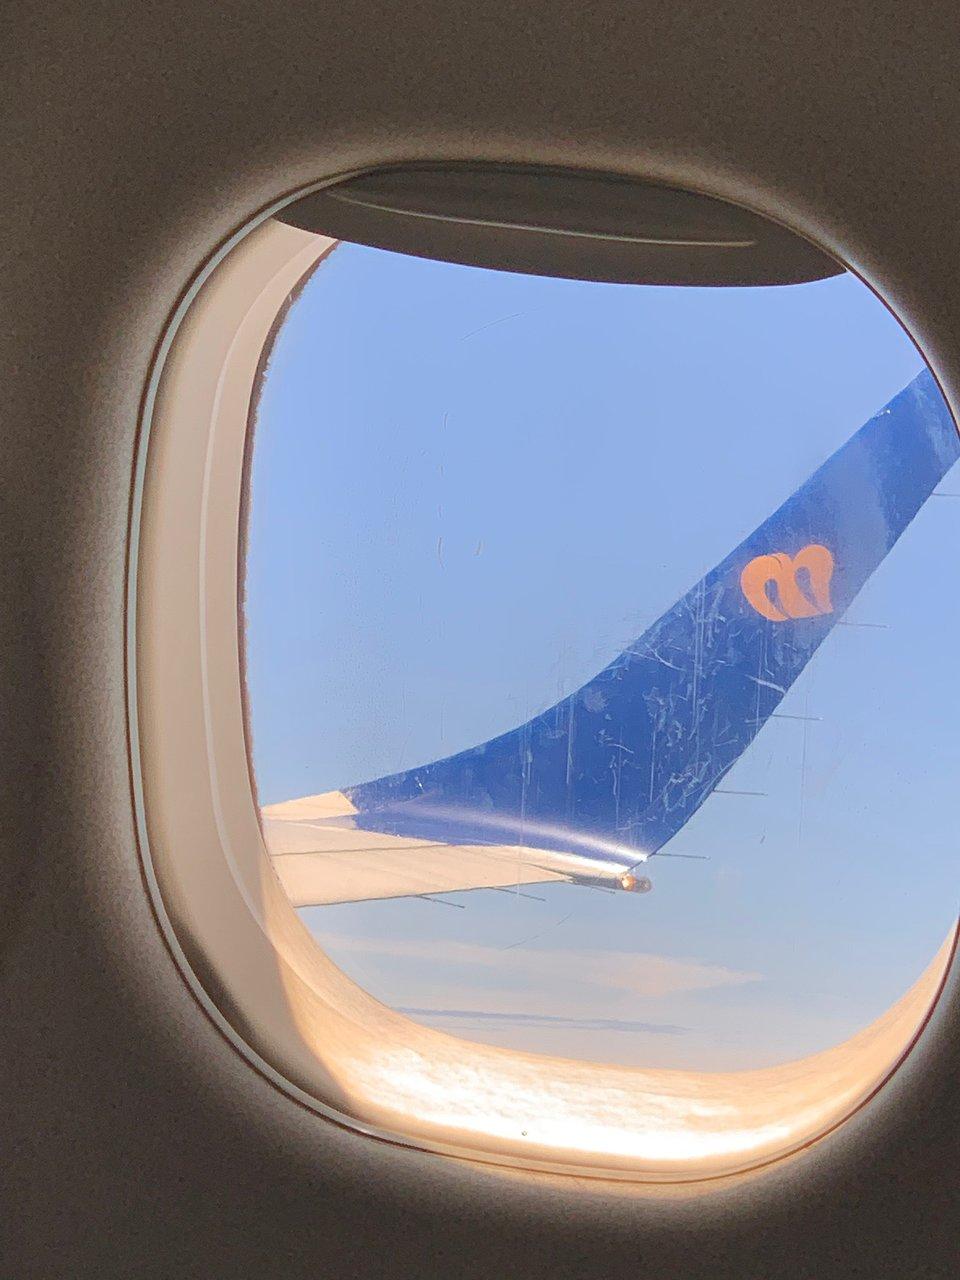 china airlines flights and reviews with photos tripadvisor rh tripadvisor com